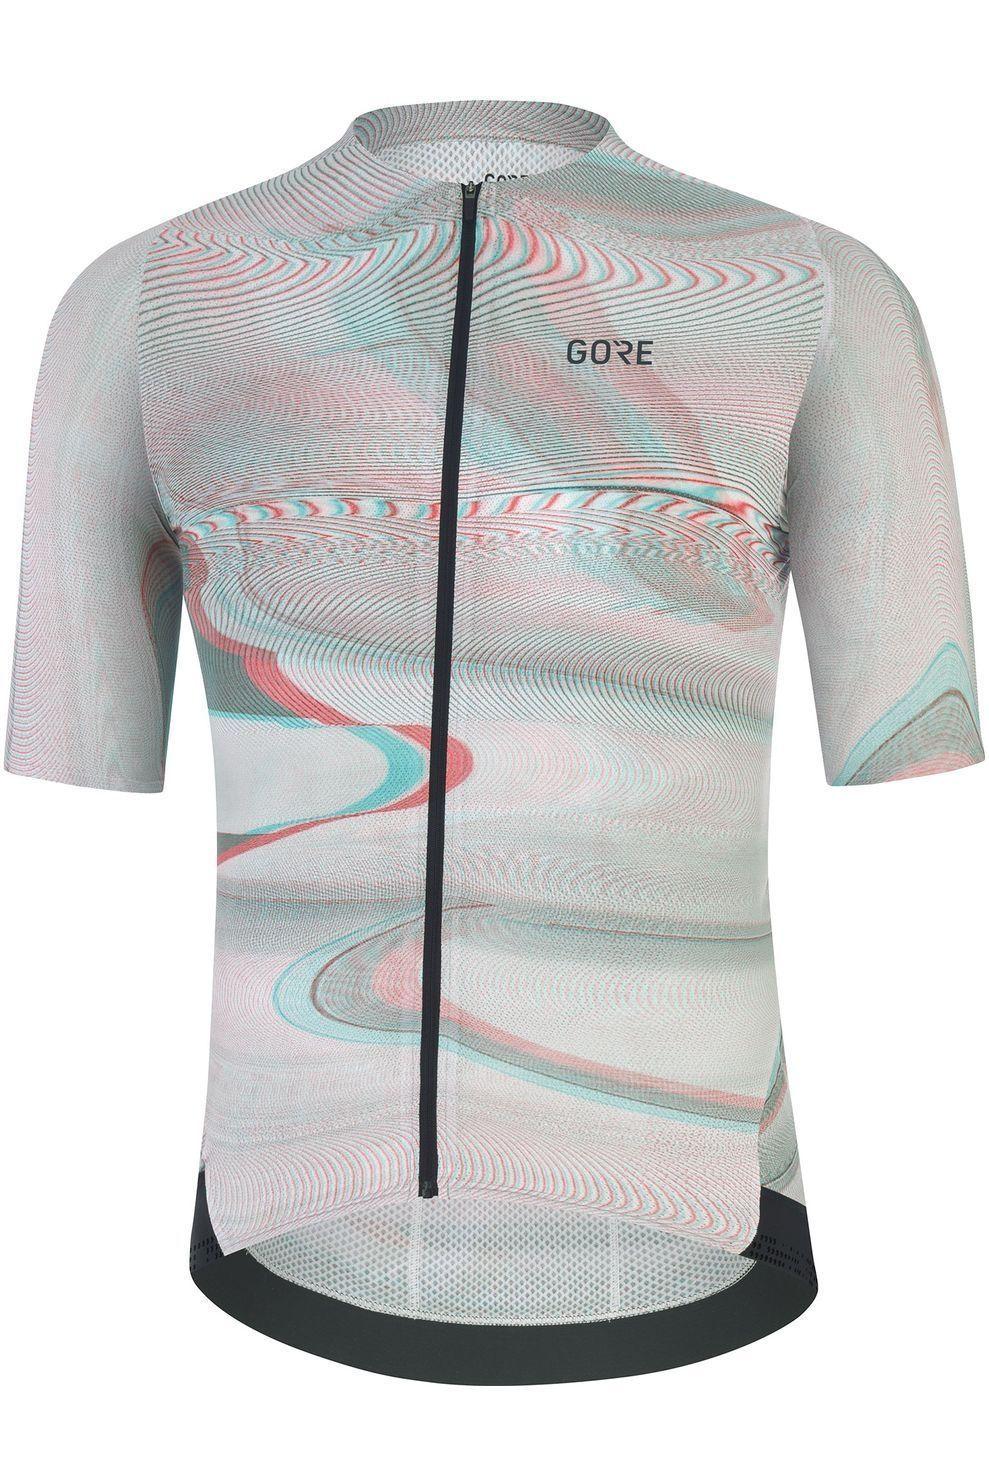 GORE WEAR T-Shirt Chase voor heren - Beige/ Gemengd - Maten: S, M, L, XL, XXL